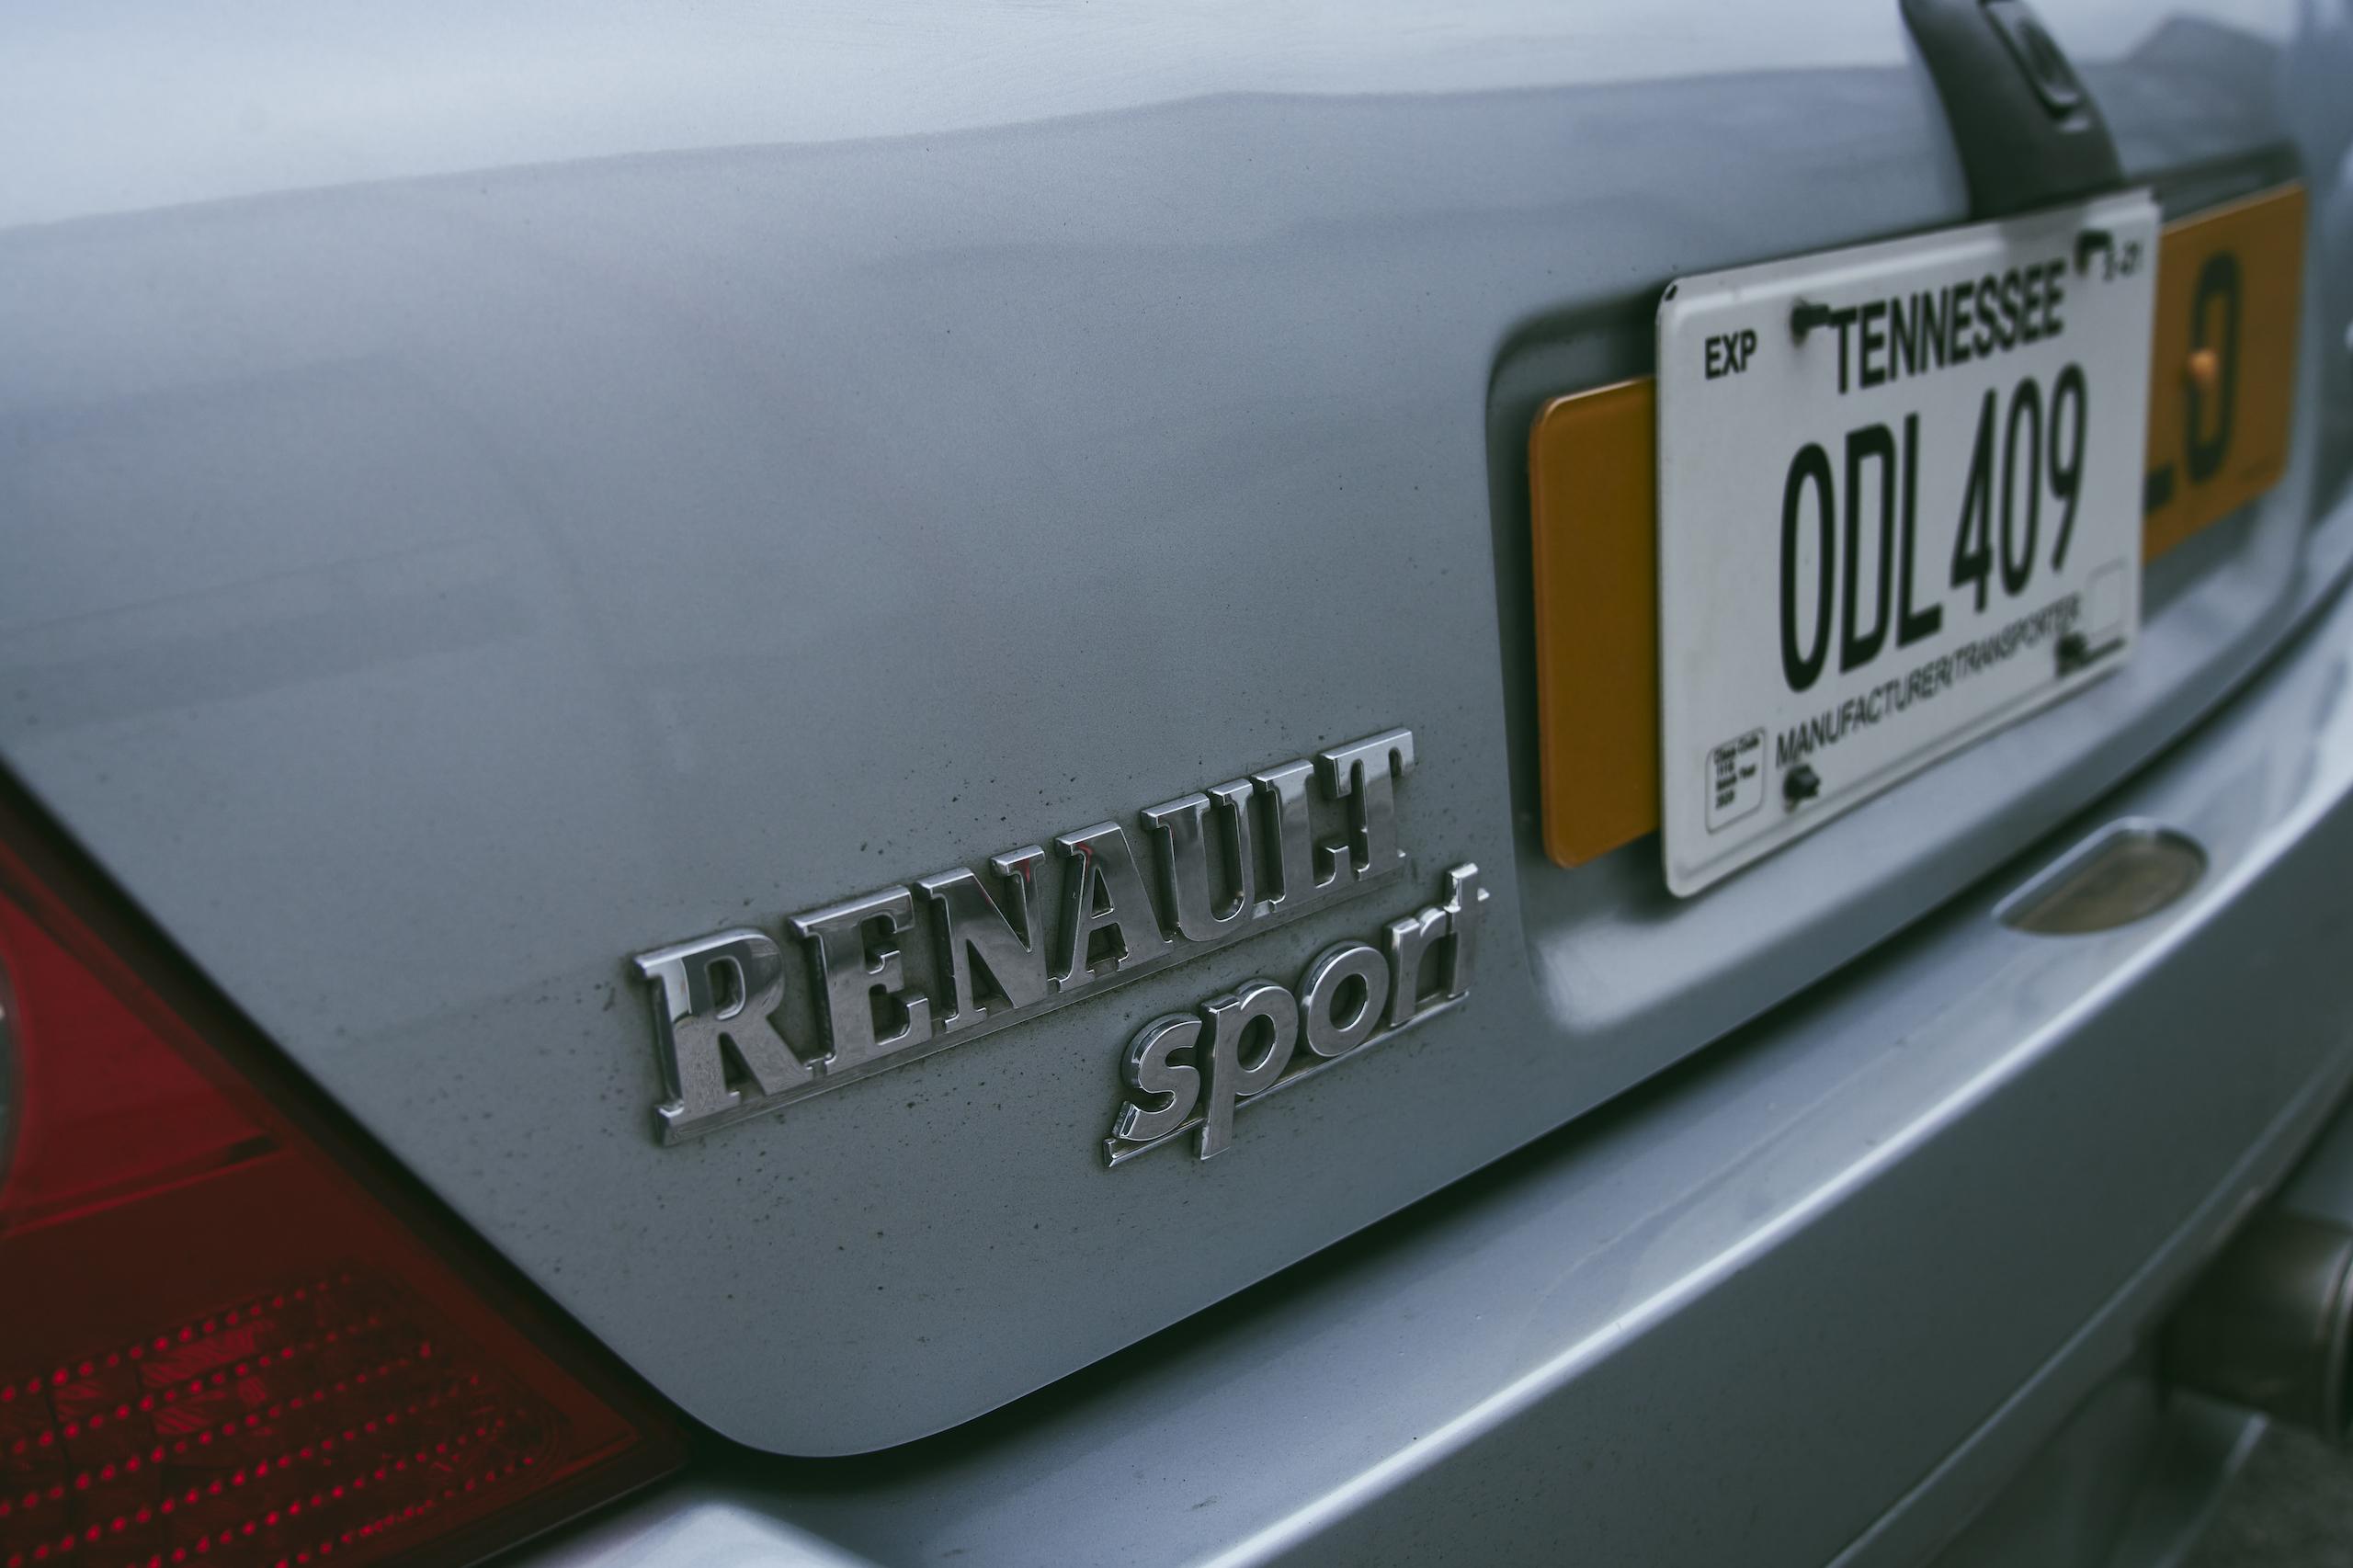 2002 Renault Clio V6 rear badge detail